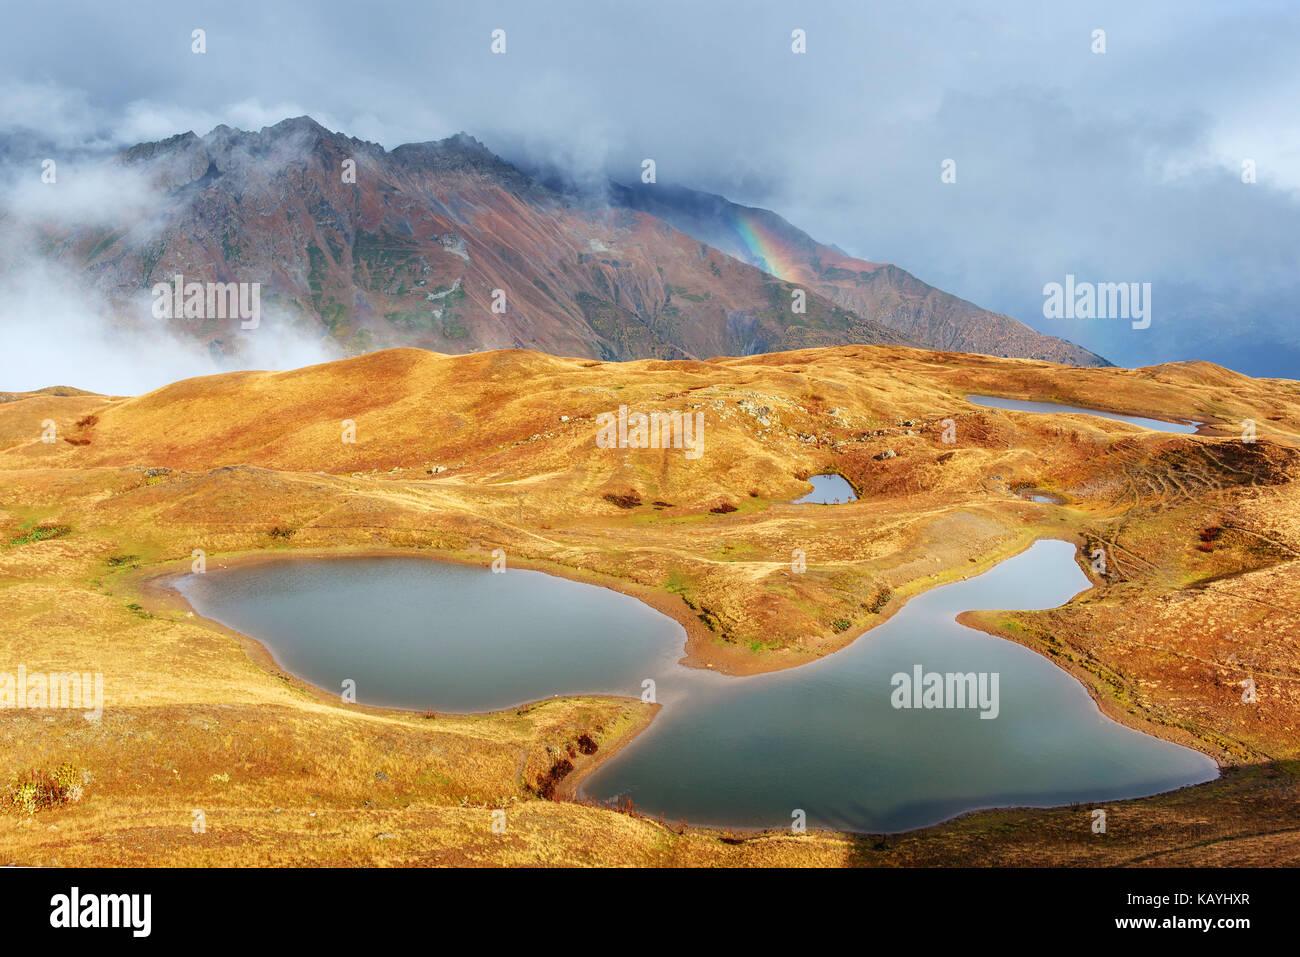 Majestuoso paisaje de montaña. koruldi lagos y un turista admira la vista del concepto de la vida activa. Foto de stock